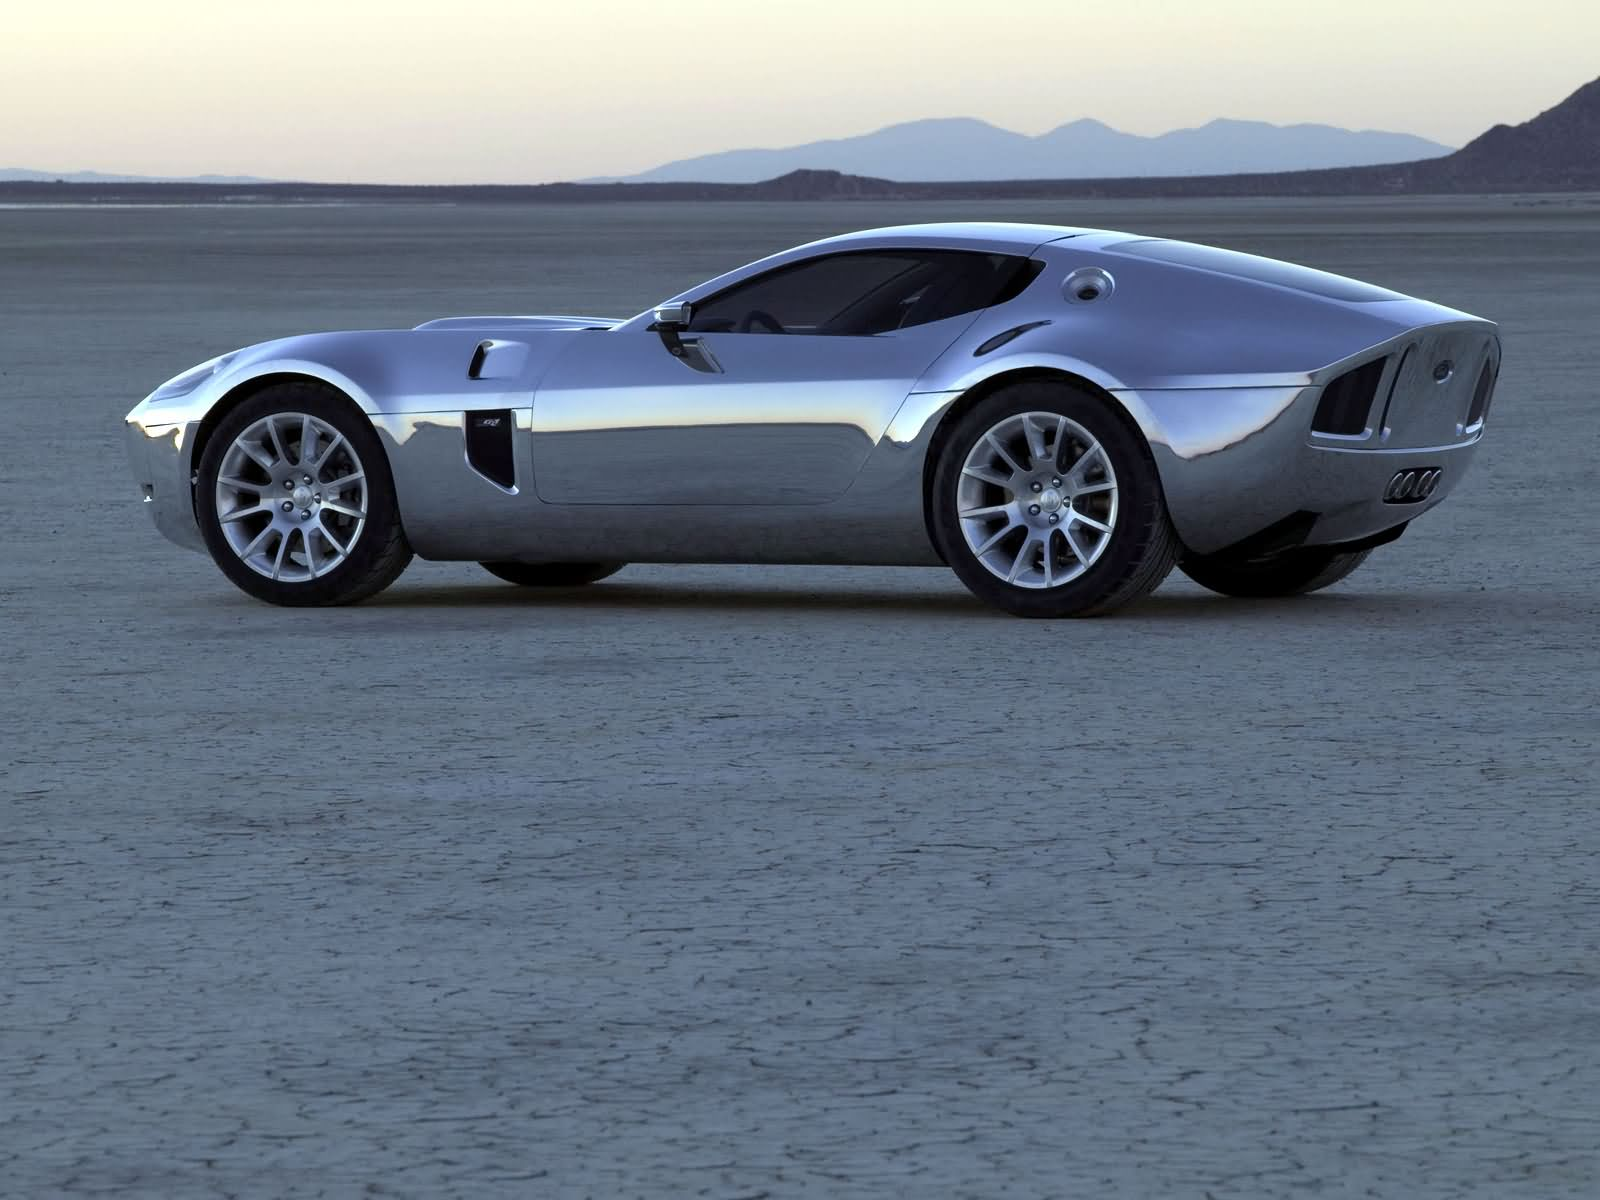 модель машины ford shelby gr-1 concept